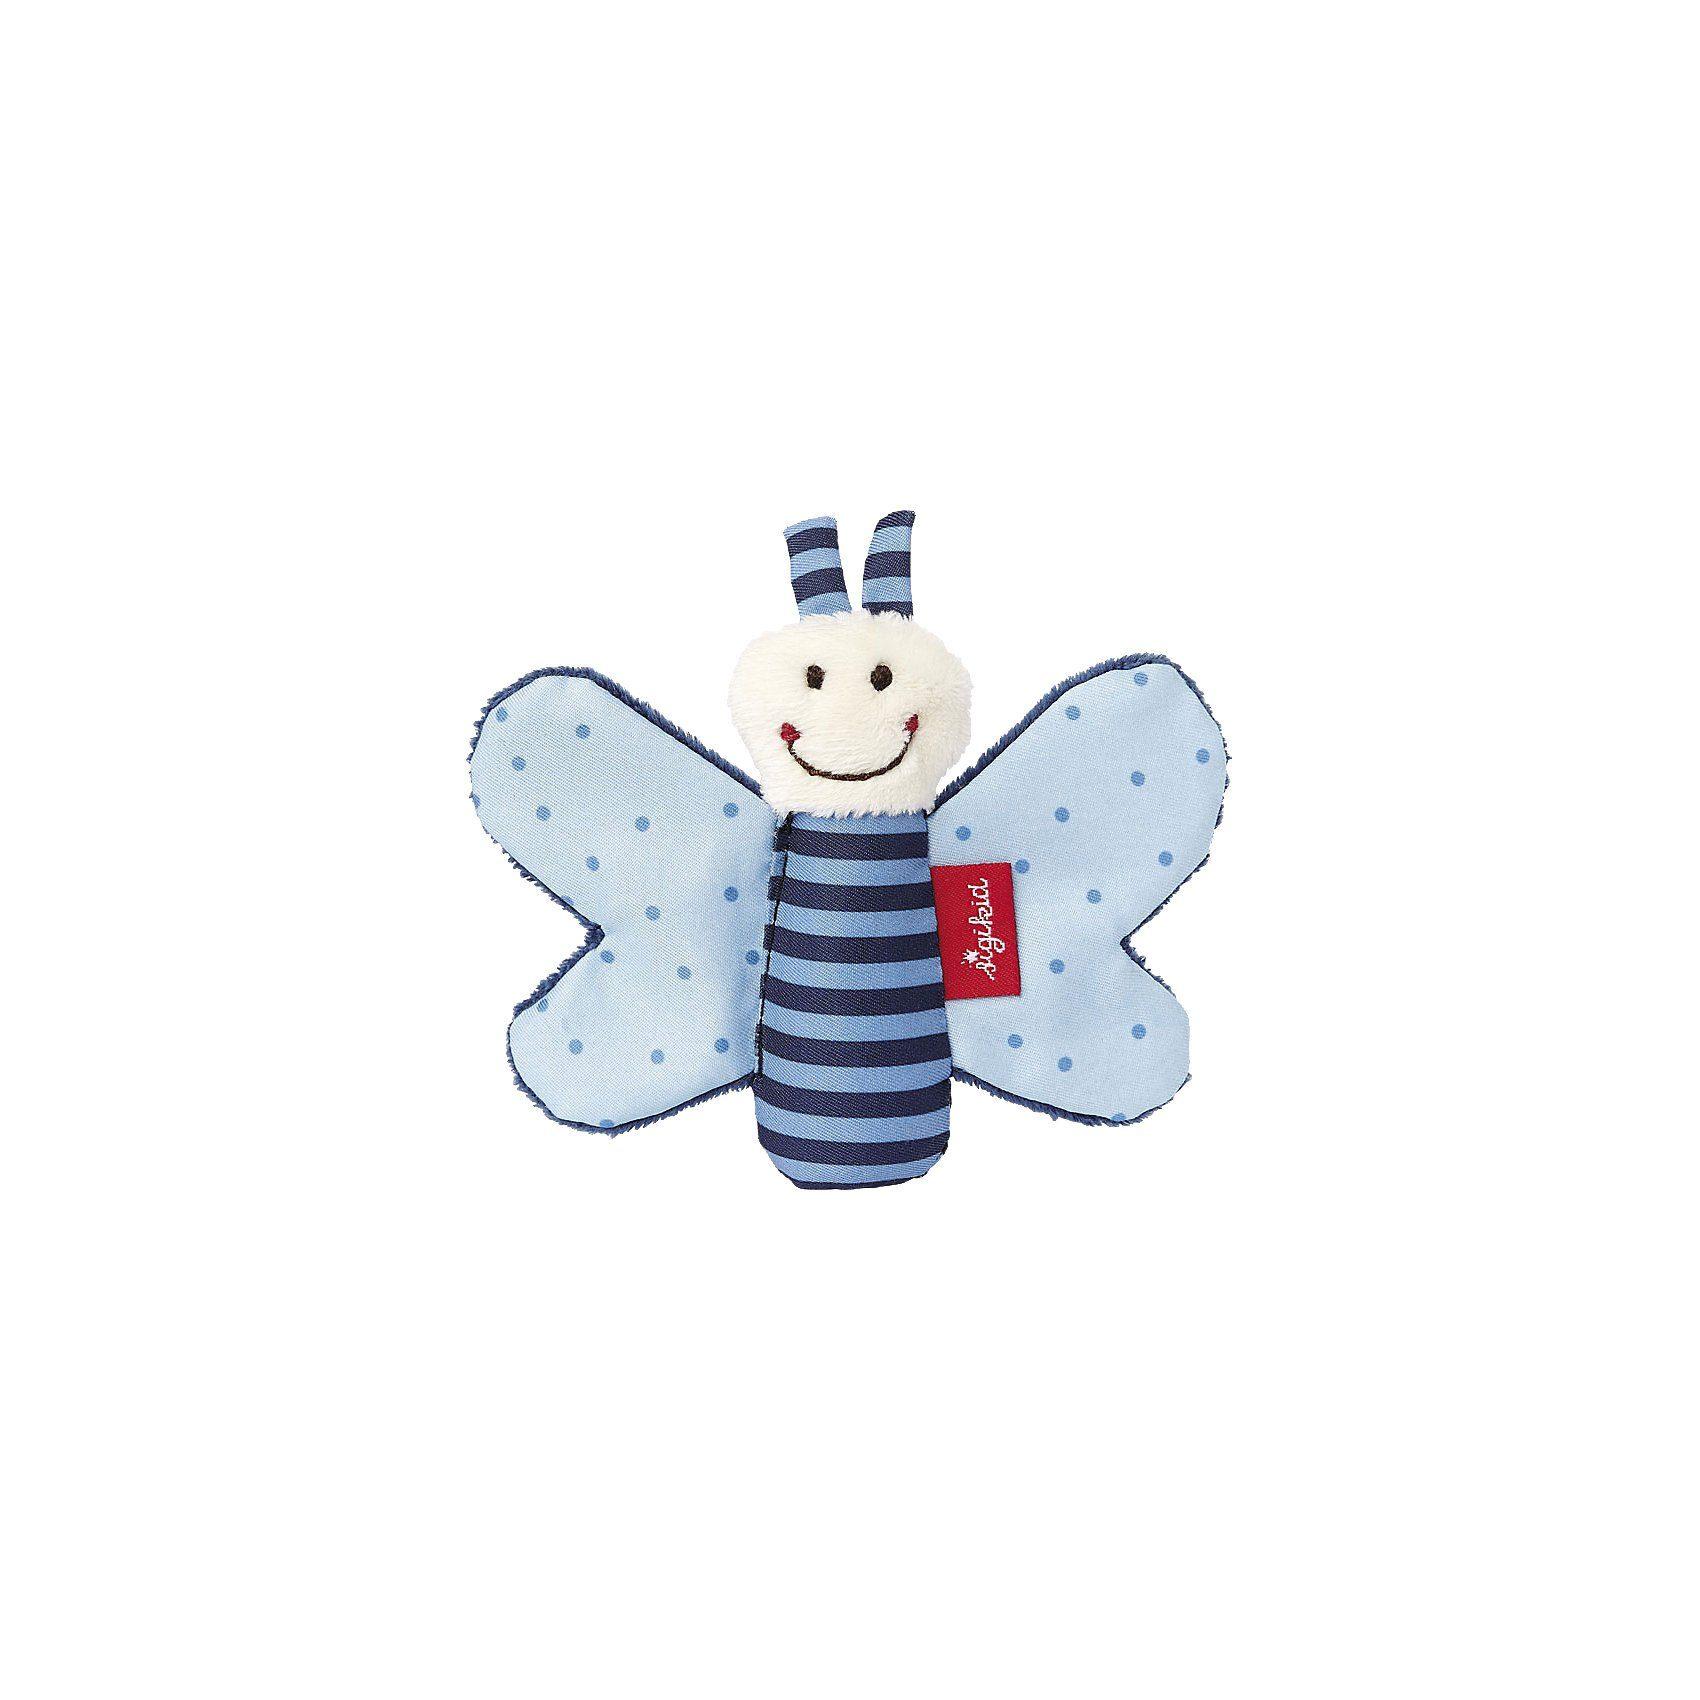 sigikid Knister-Schmetterling, blau